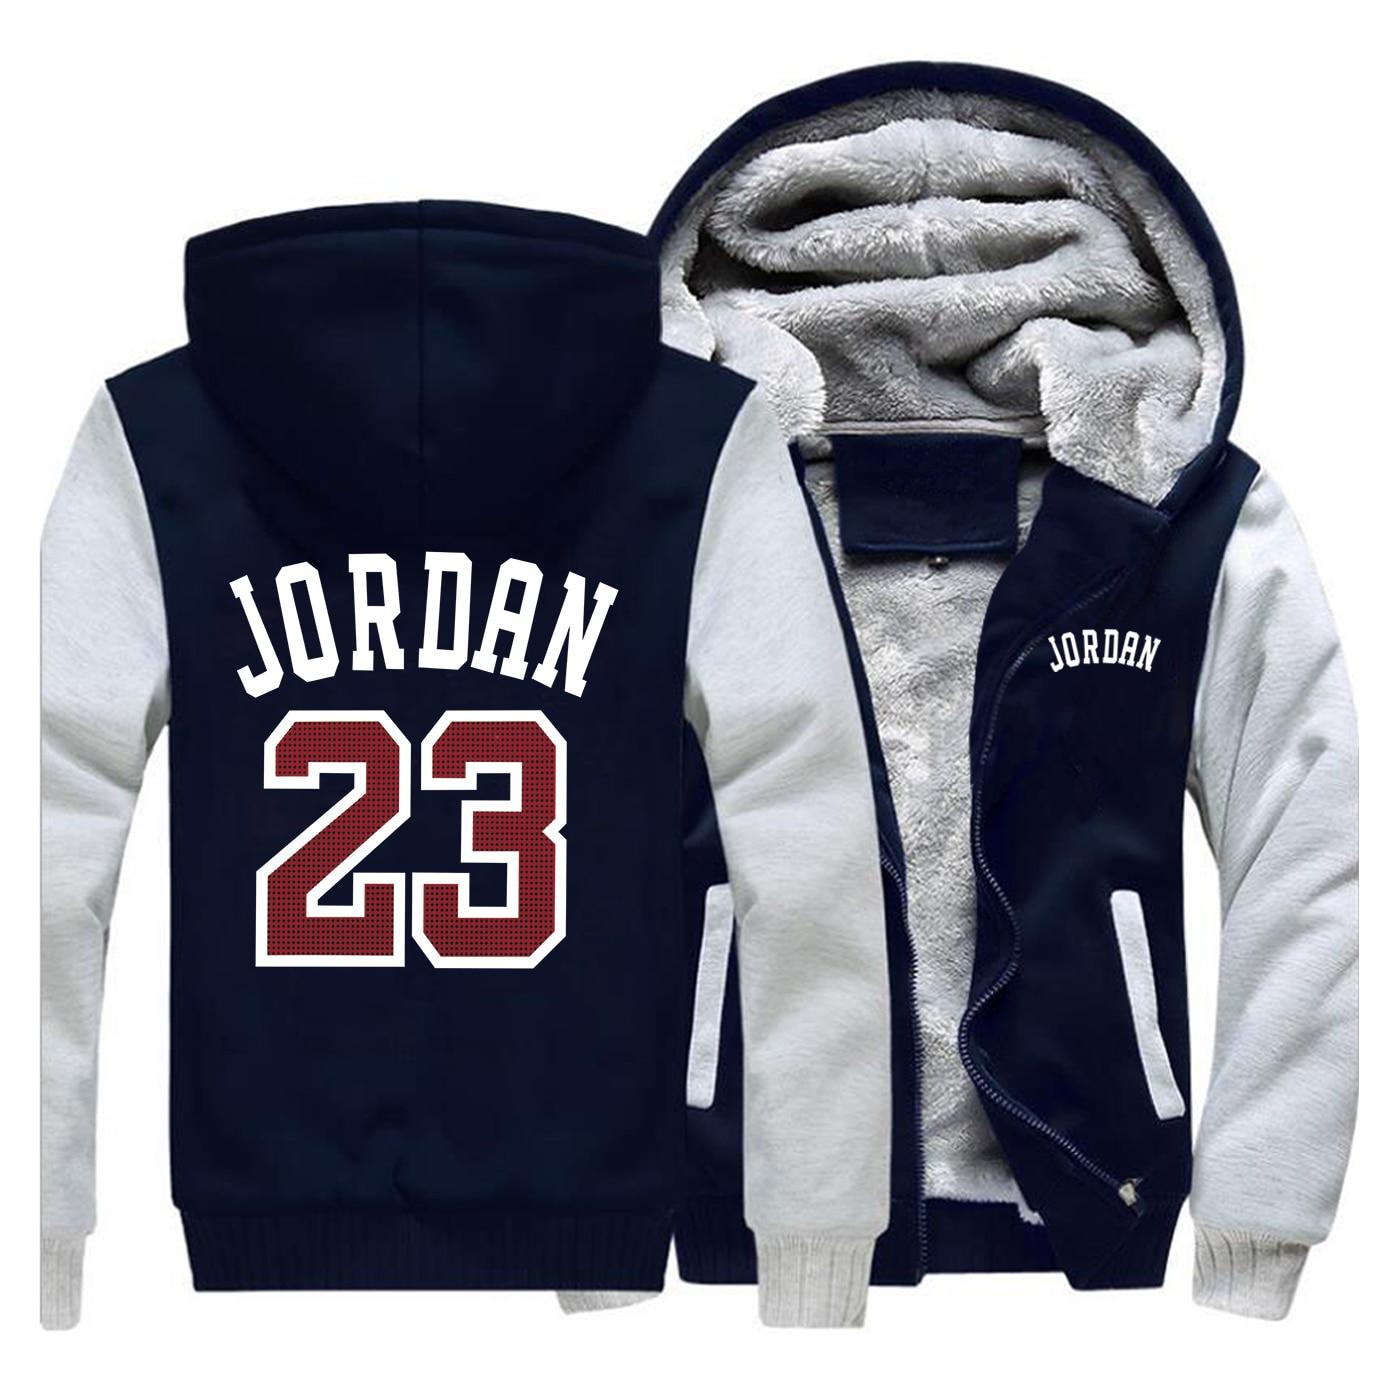 Winter 2019 Hot Sale Coat Thick Hoodies 23 Fashion Hip Hop Zipper Sweatshirts Raglan Mens Funny Warm Clothing Sportswear